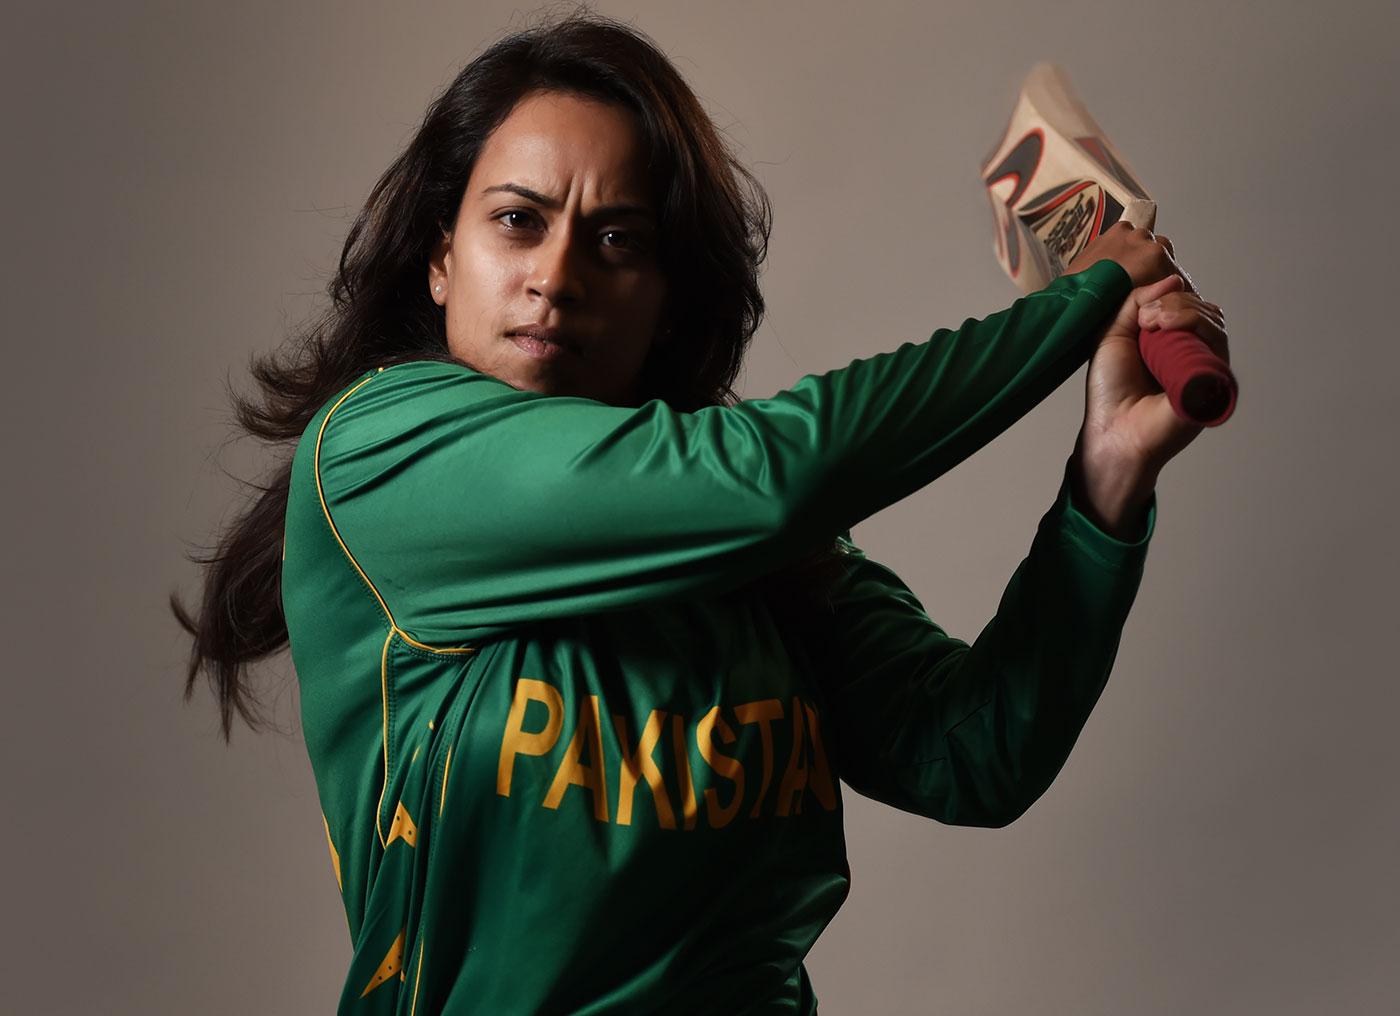 Pakistani women's cricketer Nain Abidi to play for USA soon